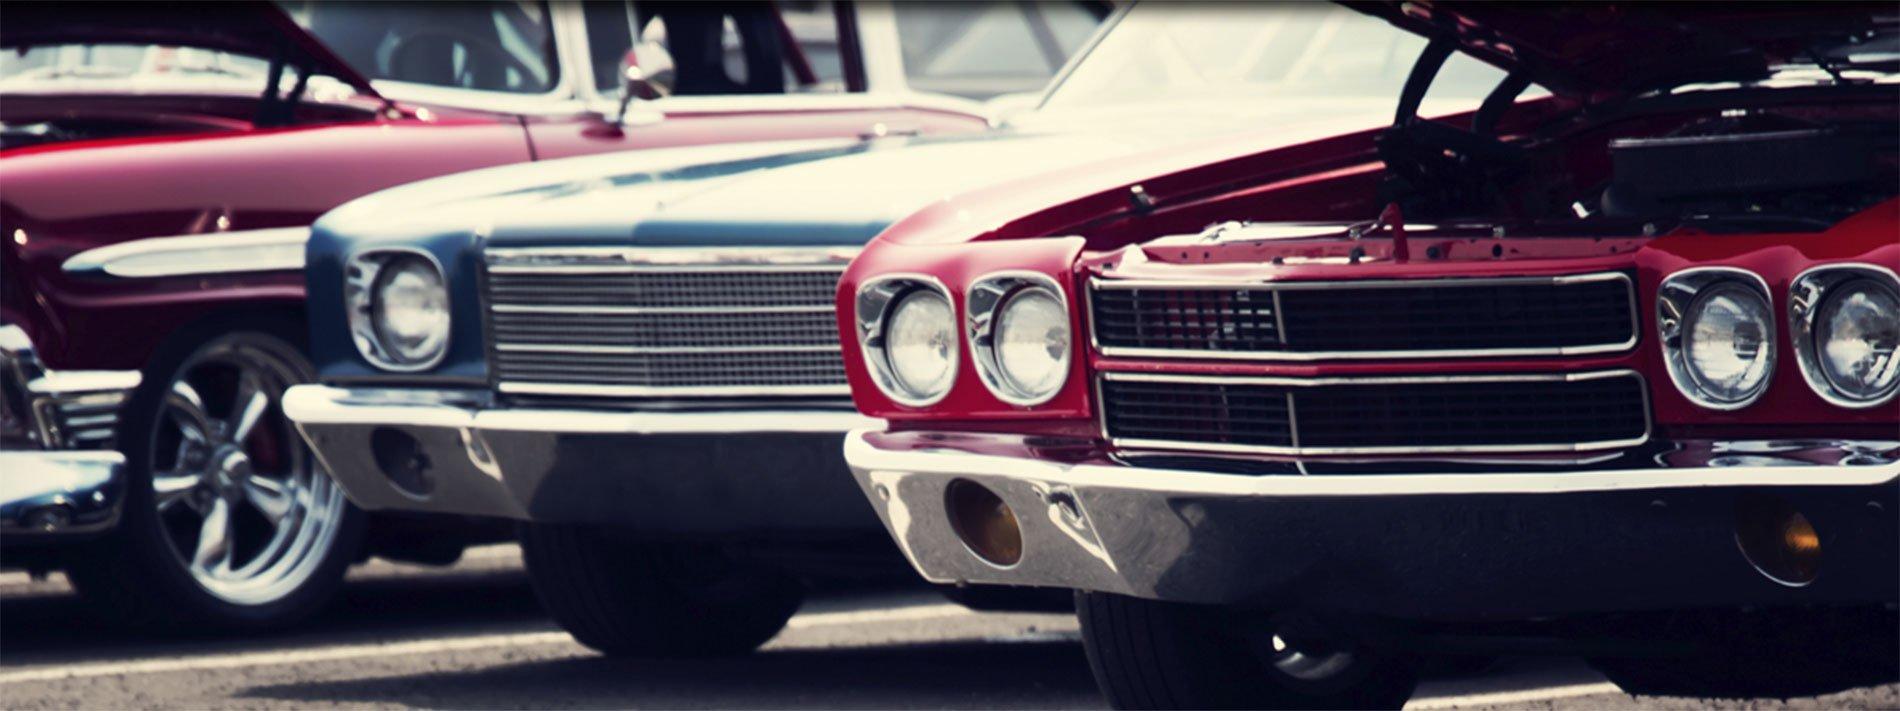 Classic Car Hoods